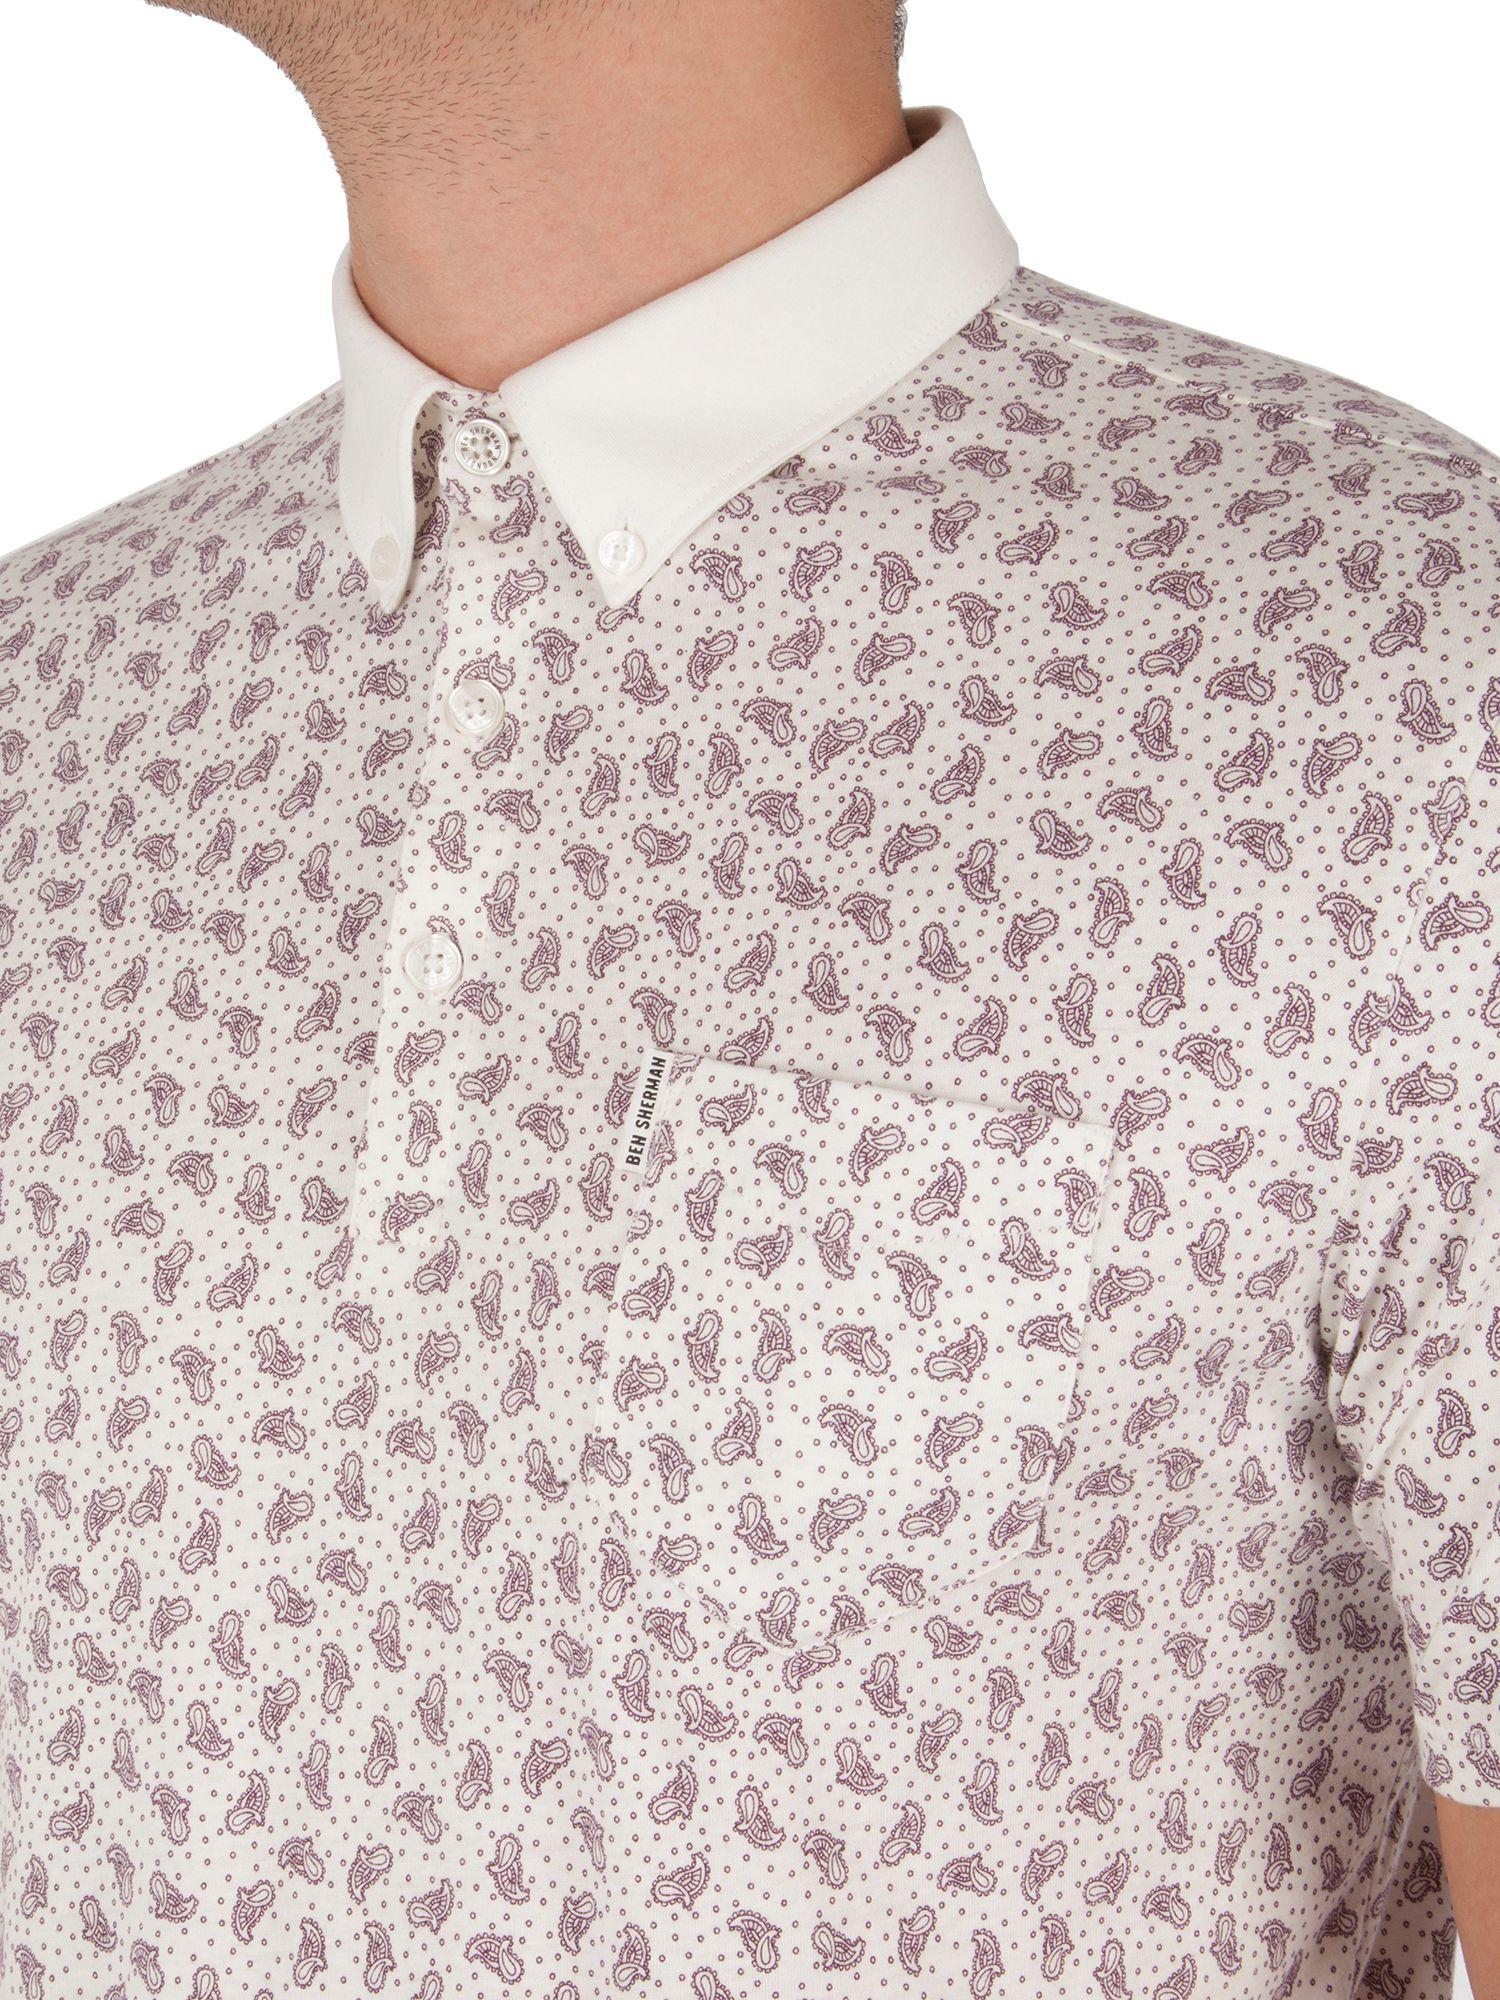 Ben Sherman Cotton Printed Paisley Polo for Men